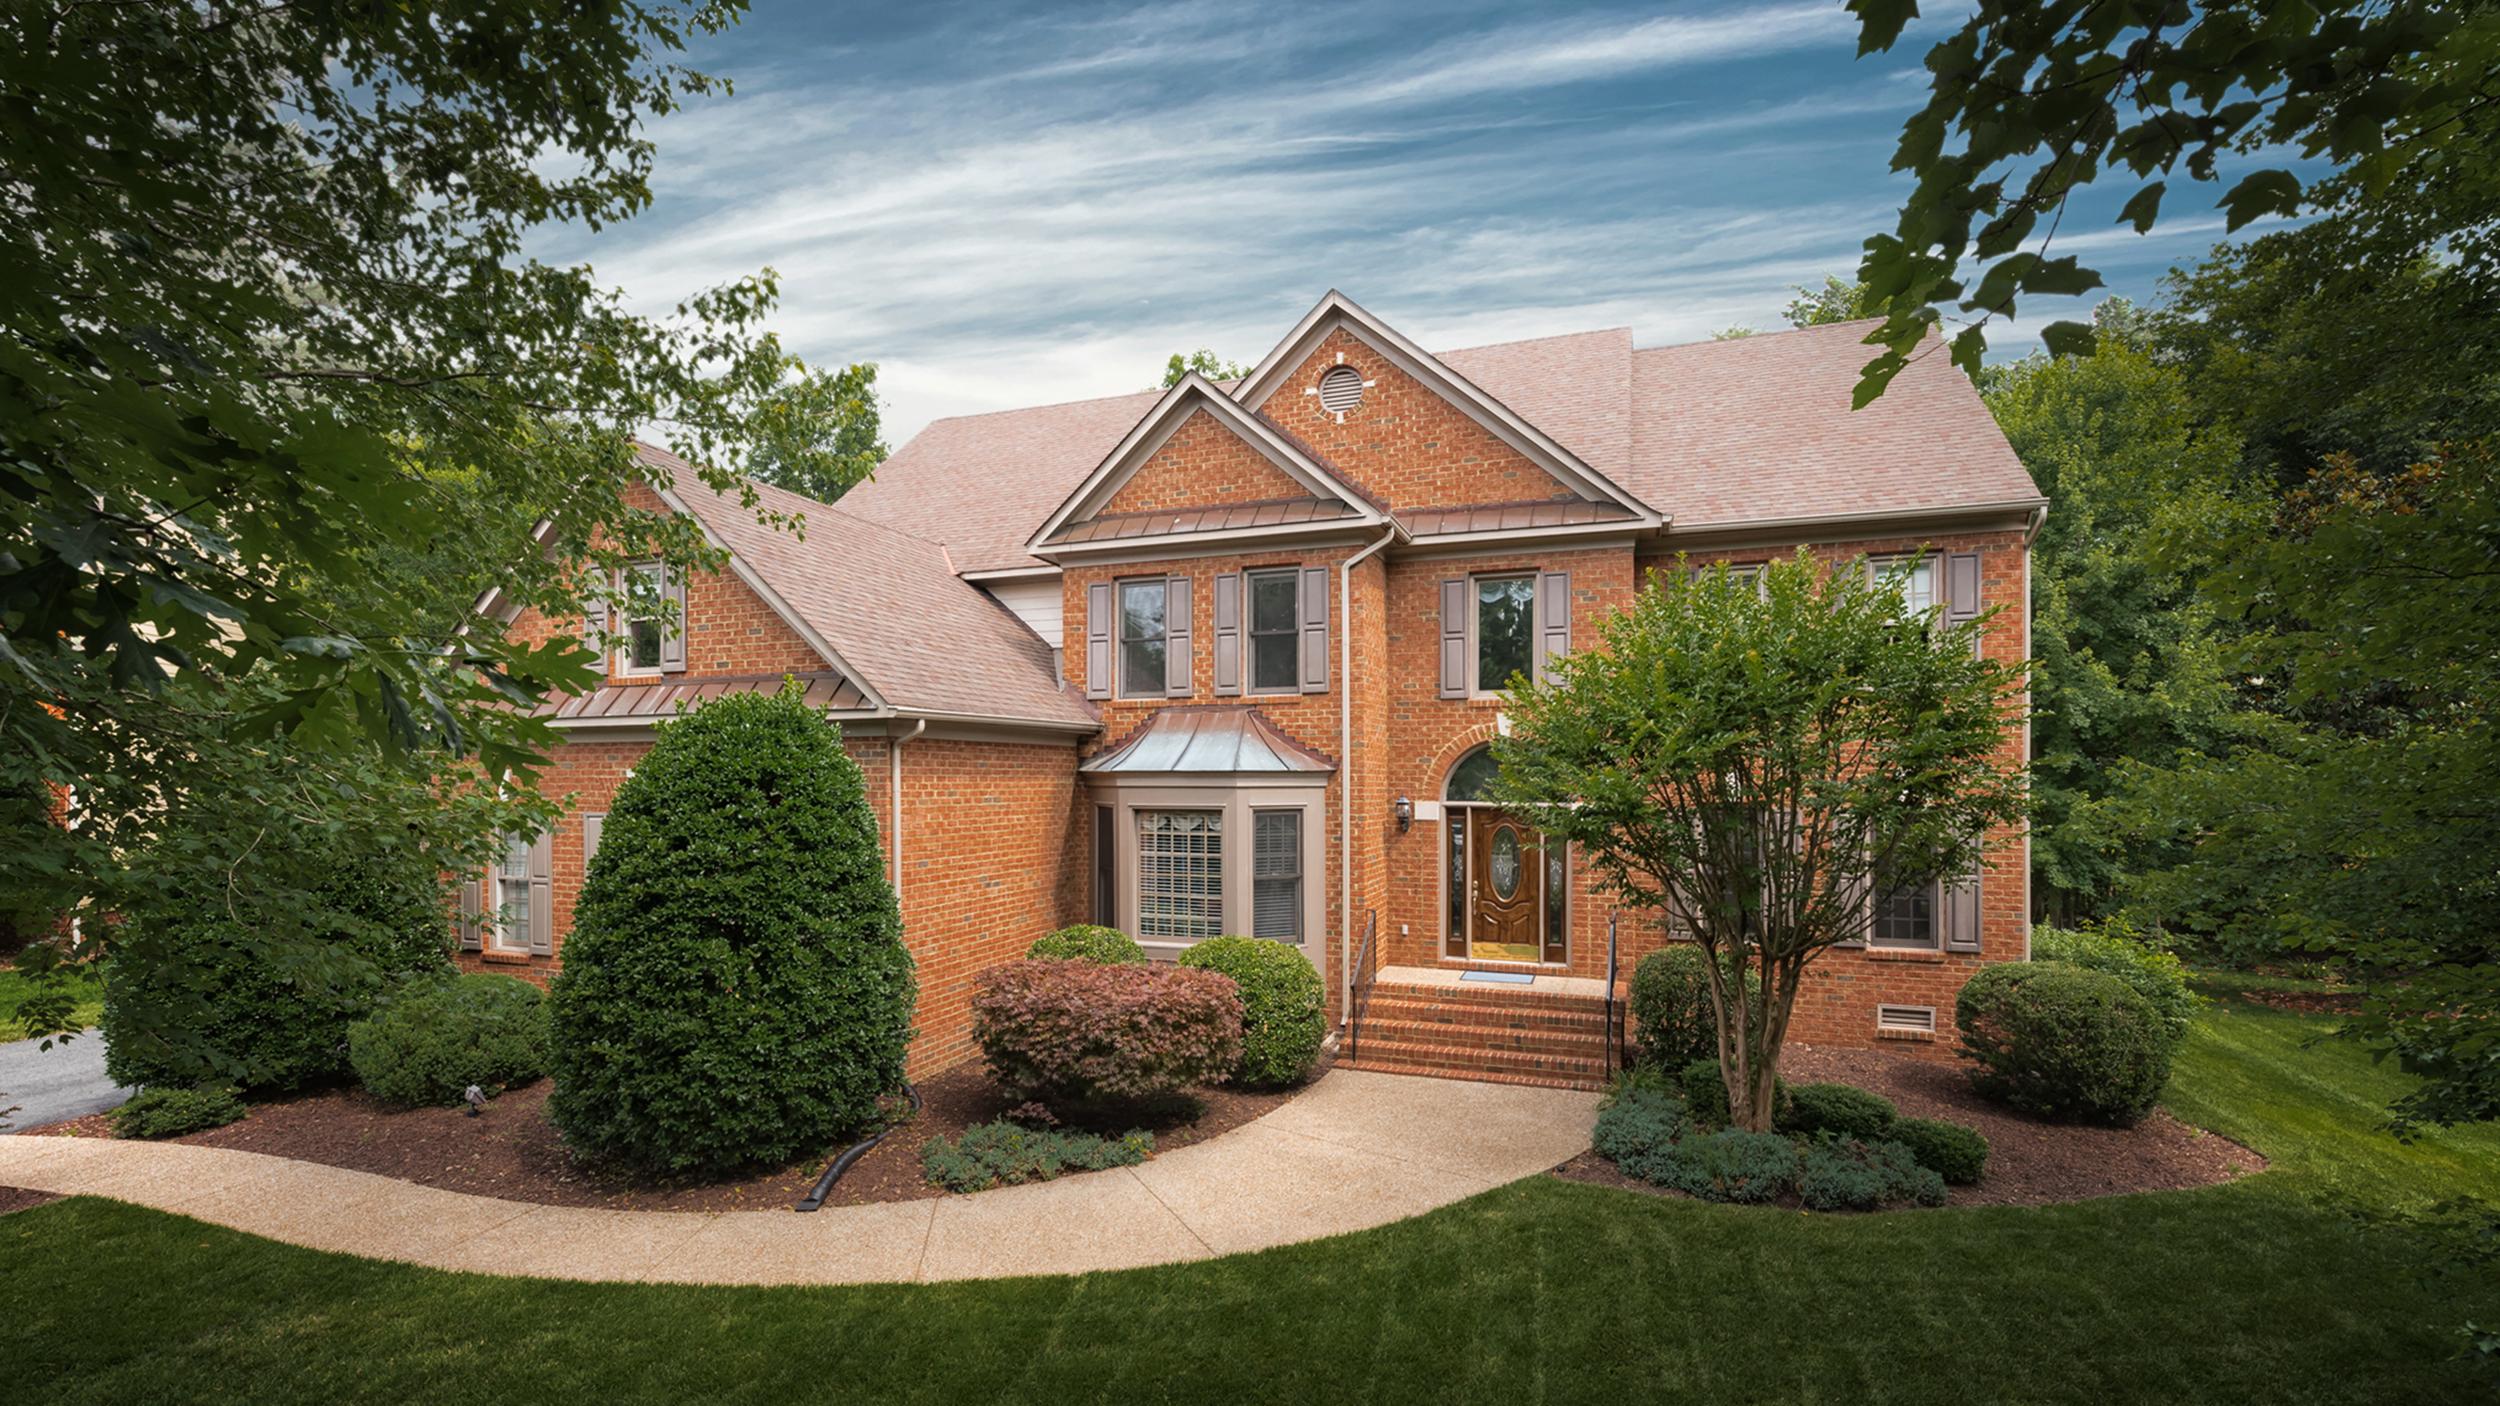 Glen Allen, VA Real Estate Photography